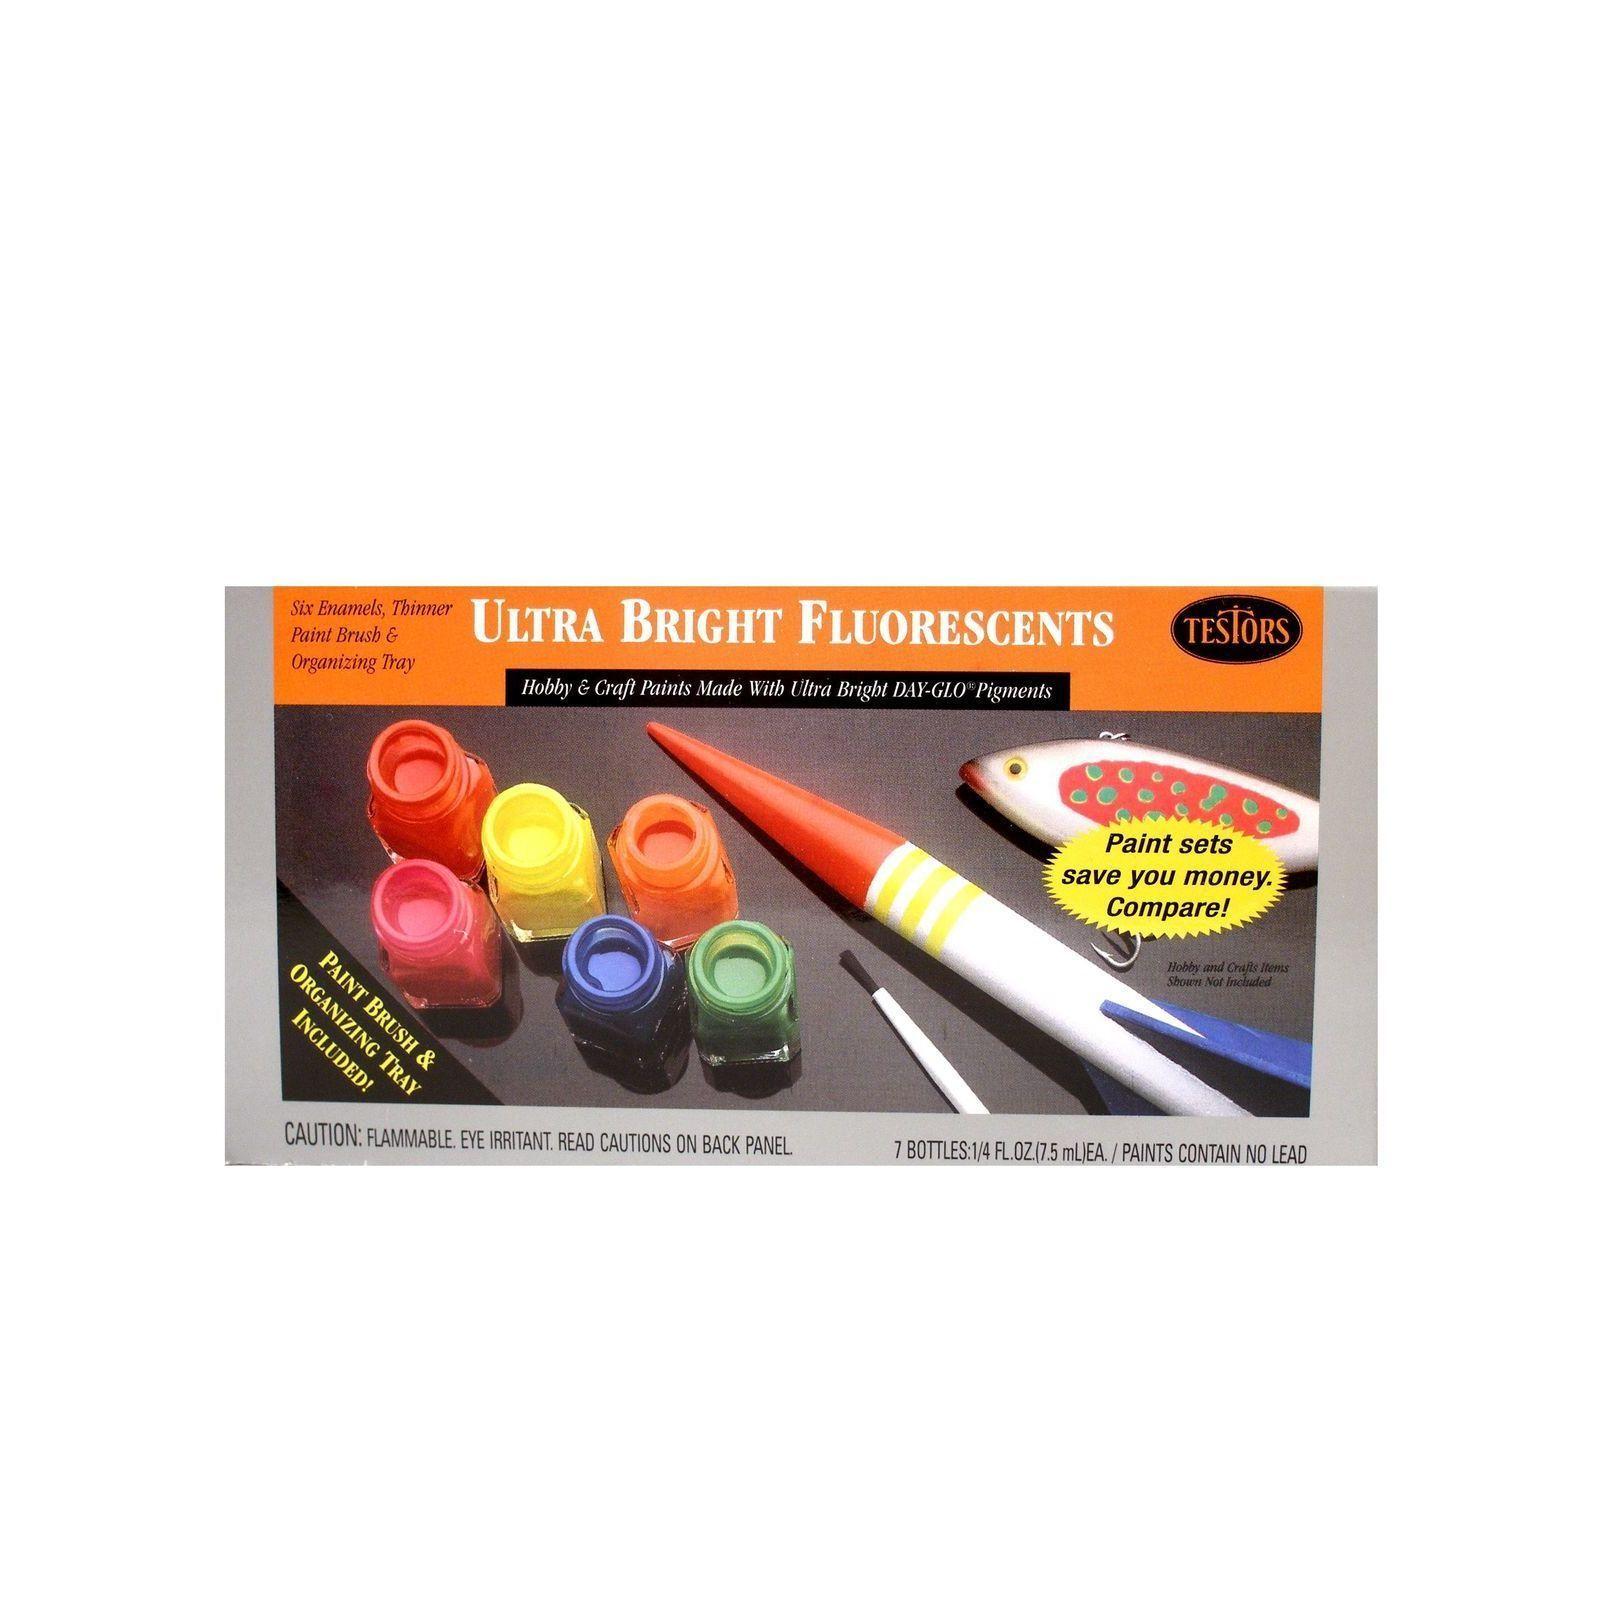 Testors Ultra Bright Fluorescent Paint Kit (Pack of 2) (e...